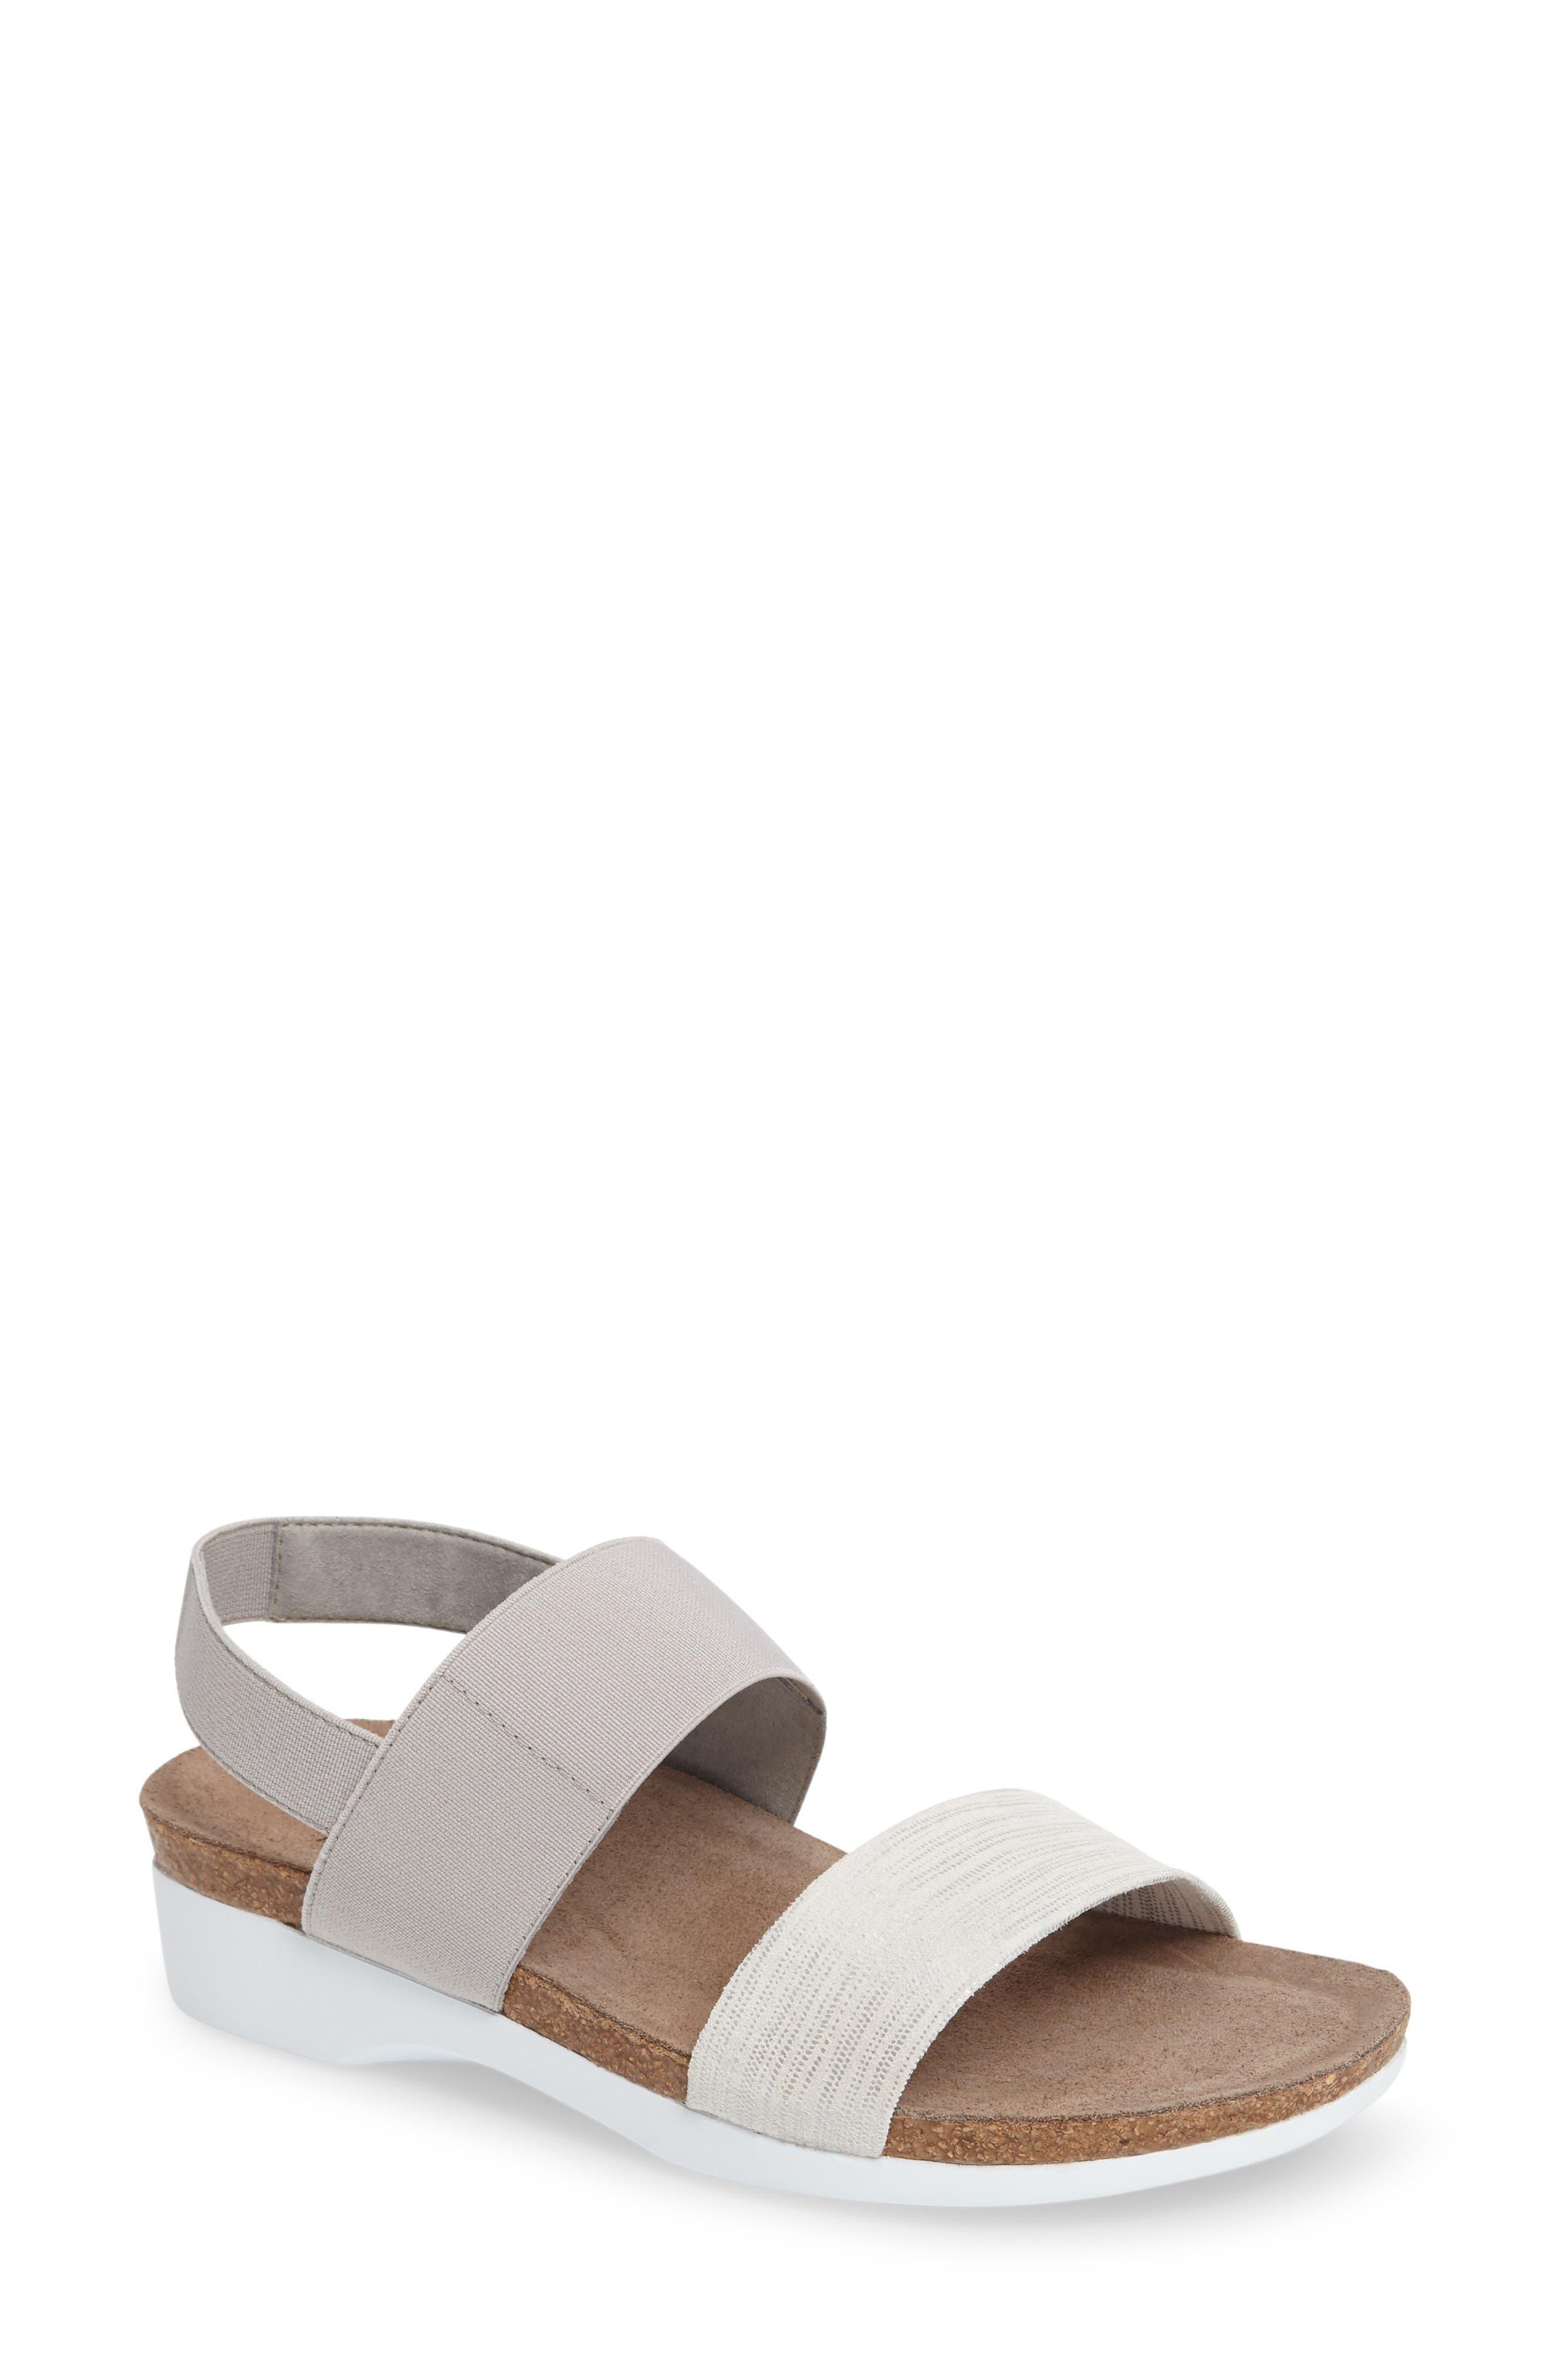 Munro 'Pisces' Sandal